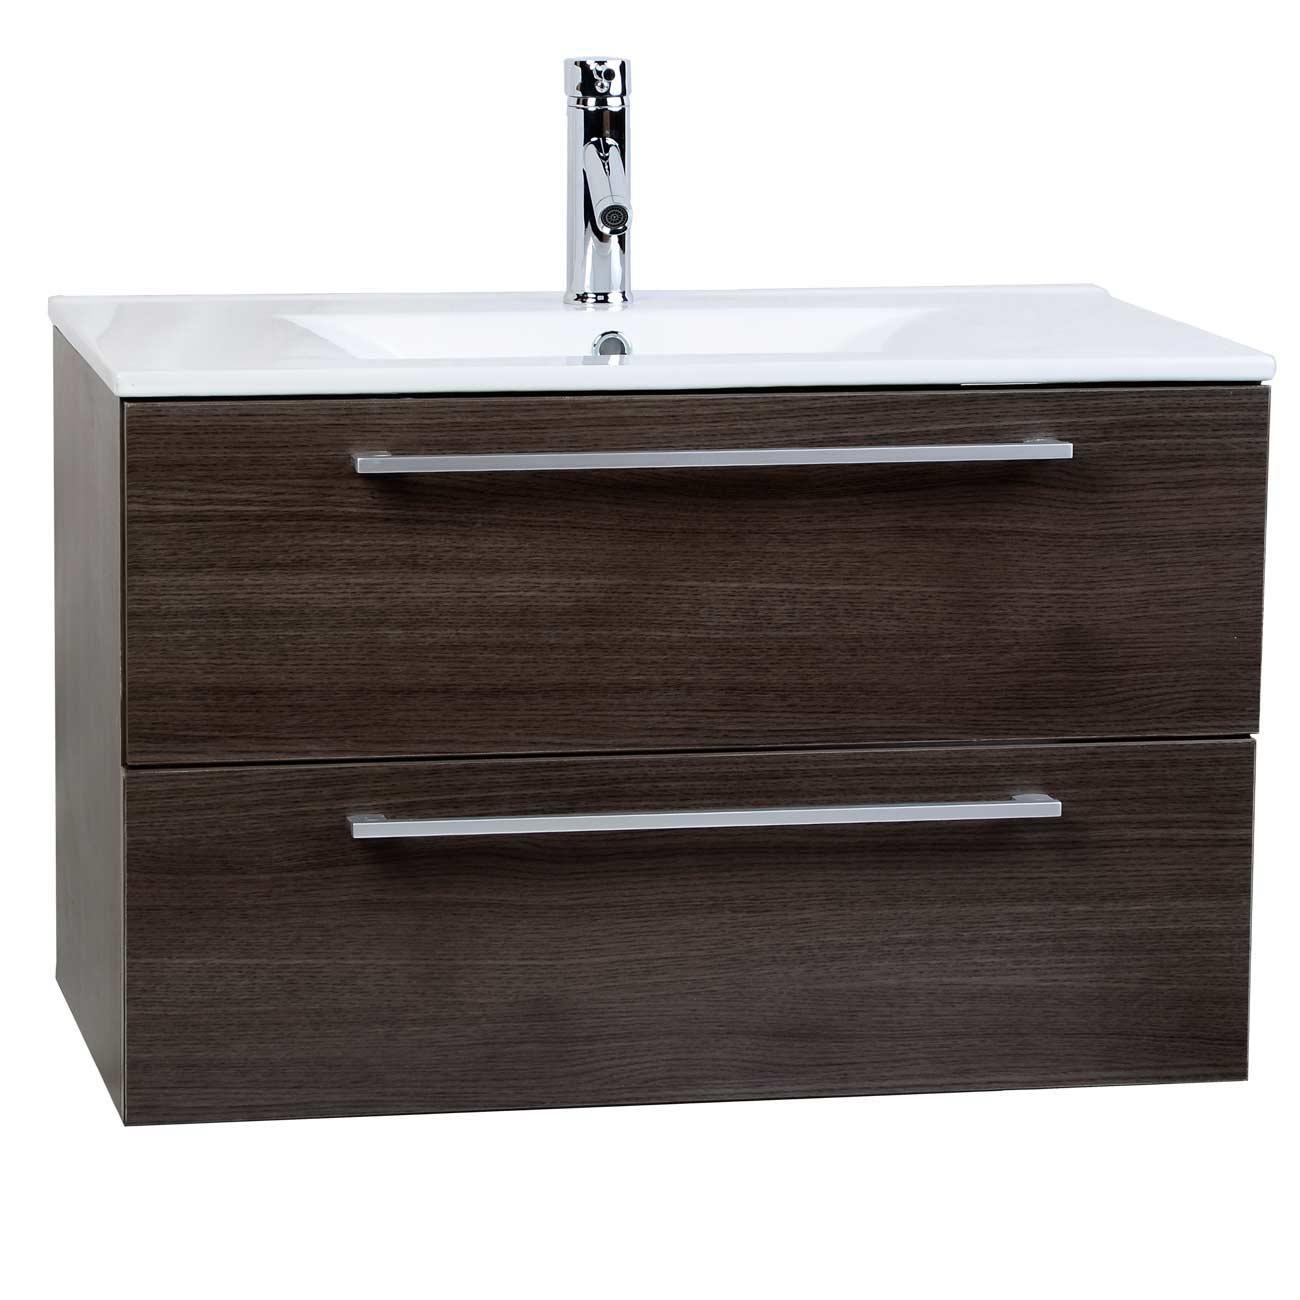 Buy Caen 32 Inch Wall Mount Modern Bathroom Vanity Set Alamo Oak Optional Mir